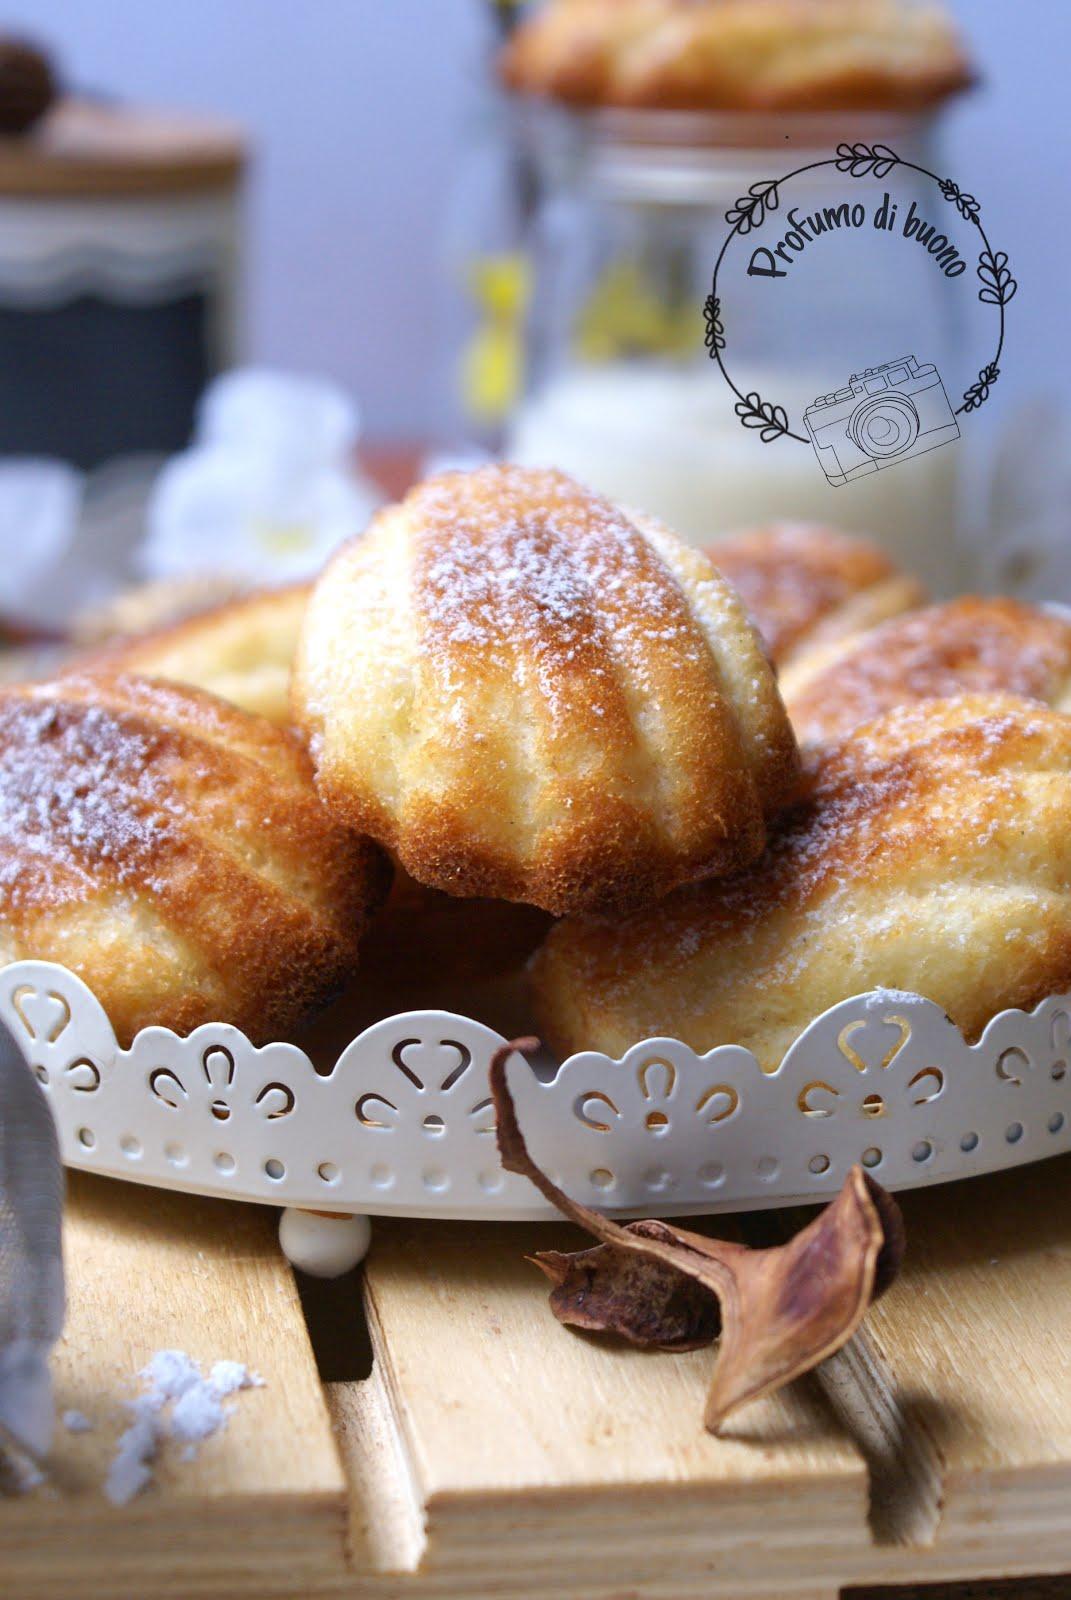 Madeleneis senza glutine con zucchero a velo